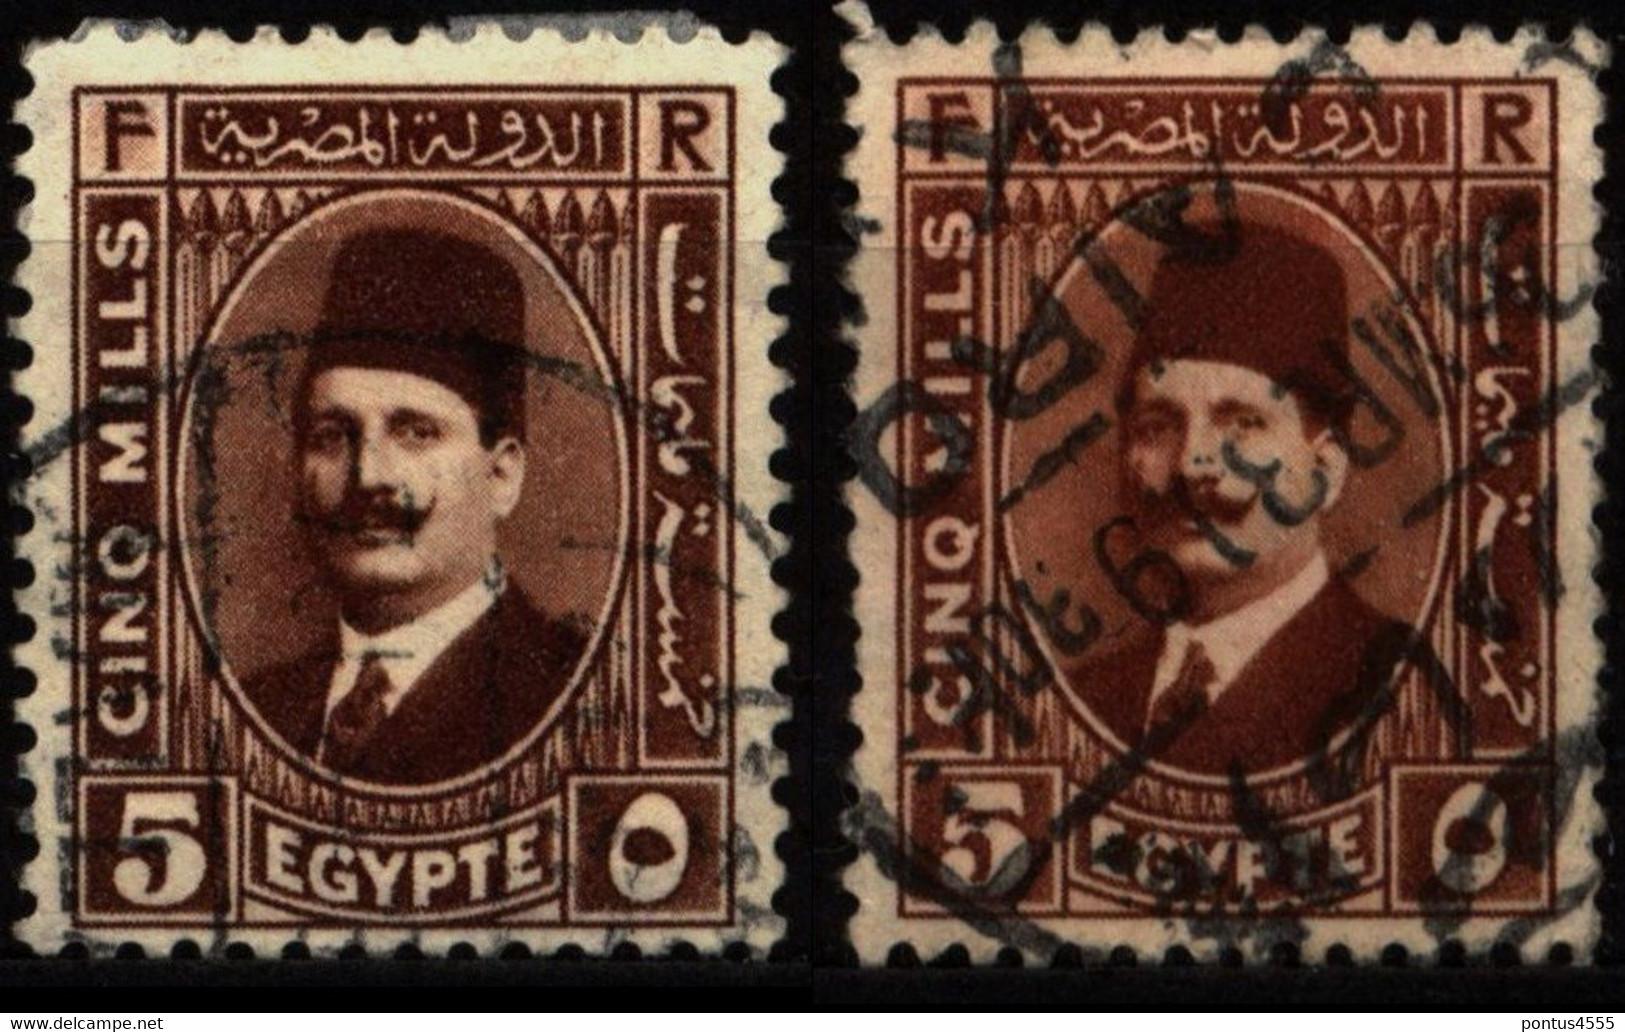 Egypt 1927 Mi 125a-125b King Fuad I - Used Stamps